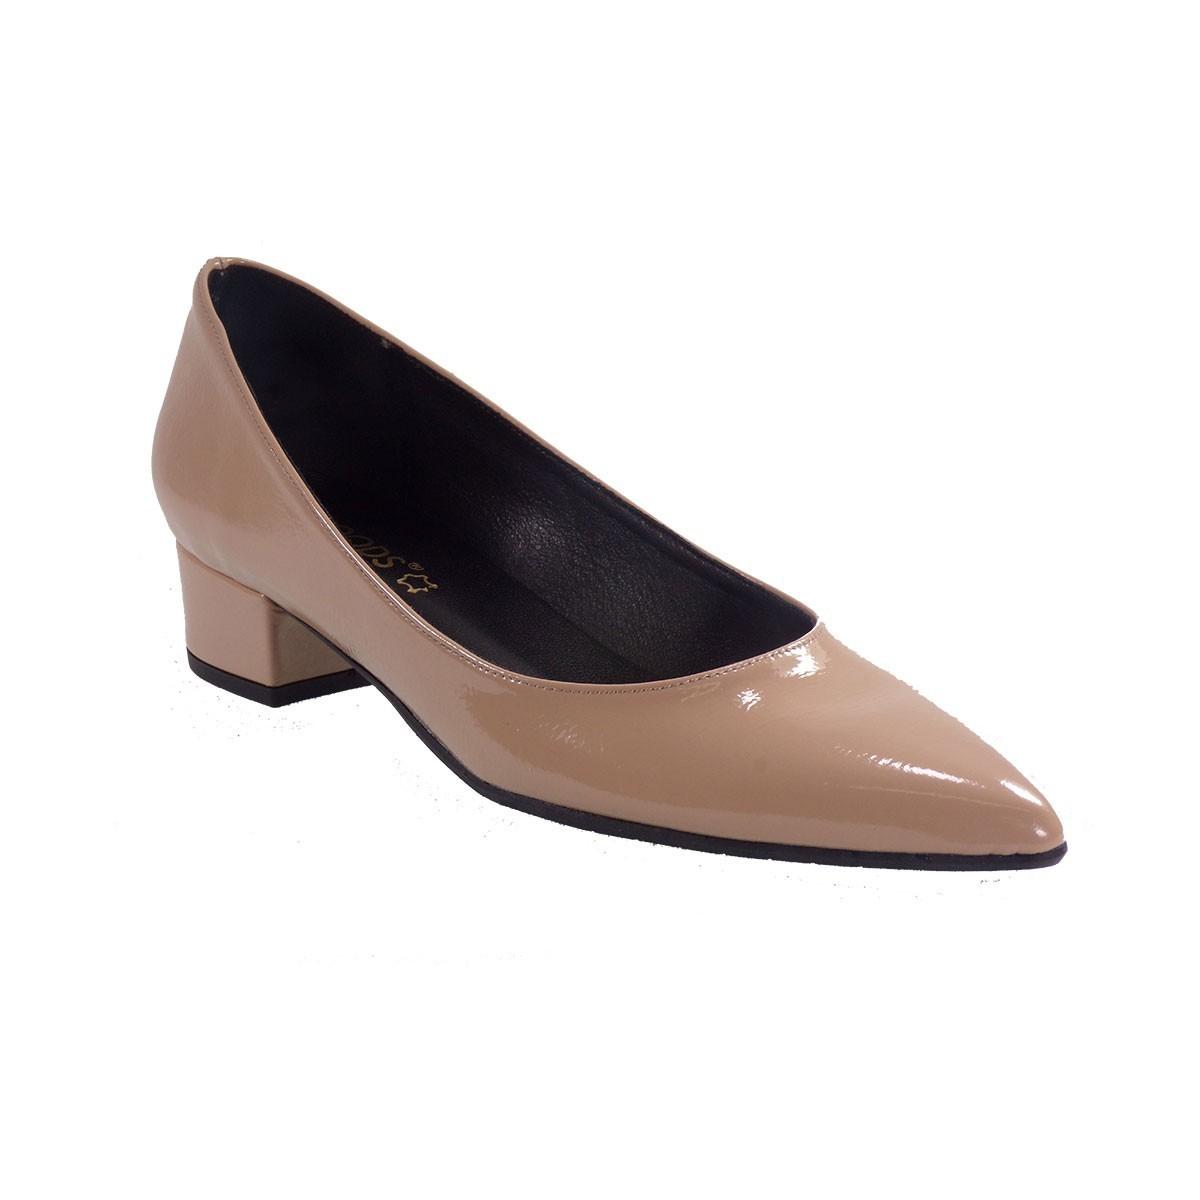 Moods Shoes Γυναικεία Παπούτσια 2542 Nude Λουστρίνι